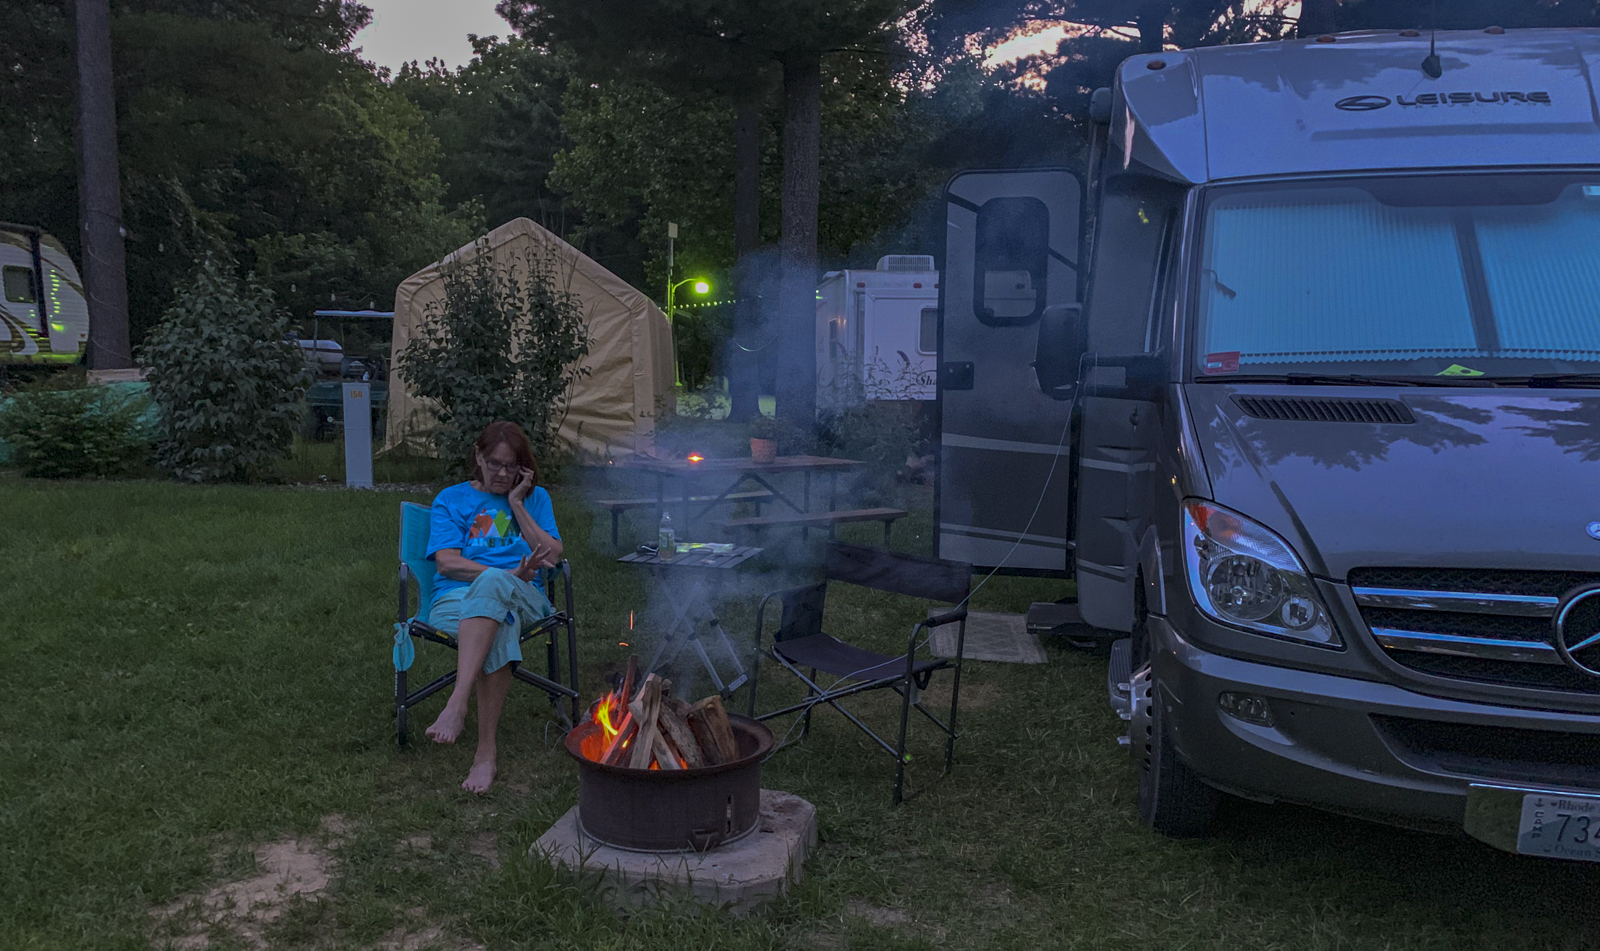 Elkhart campfire